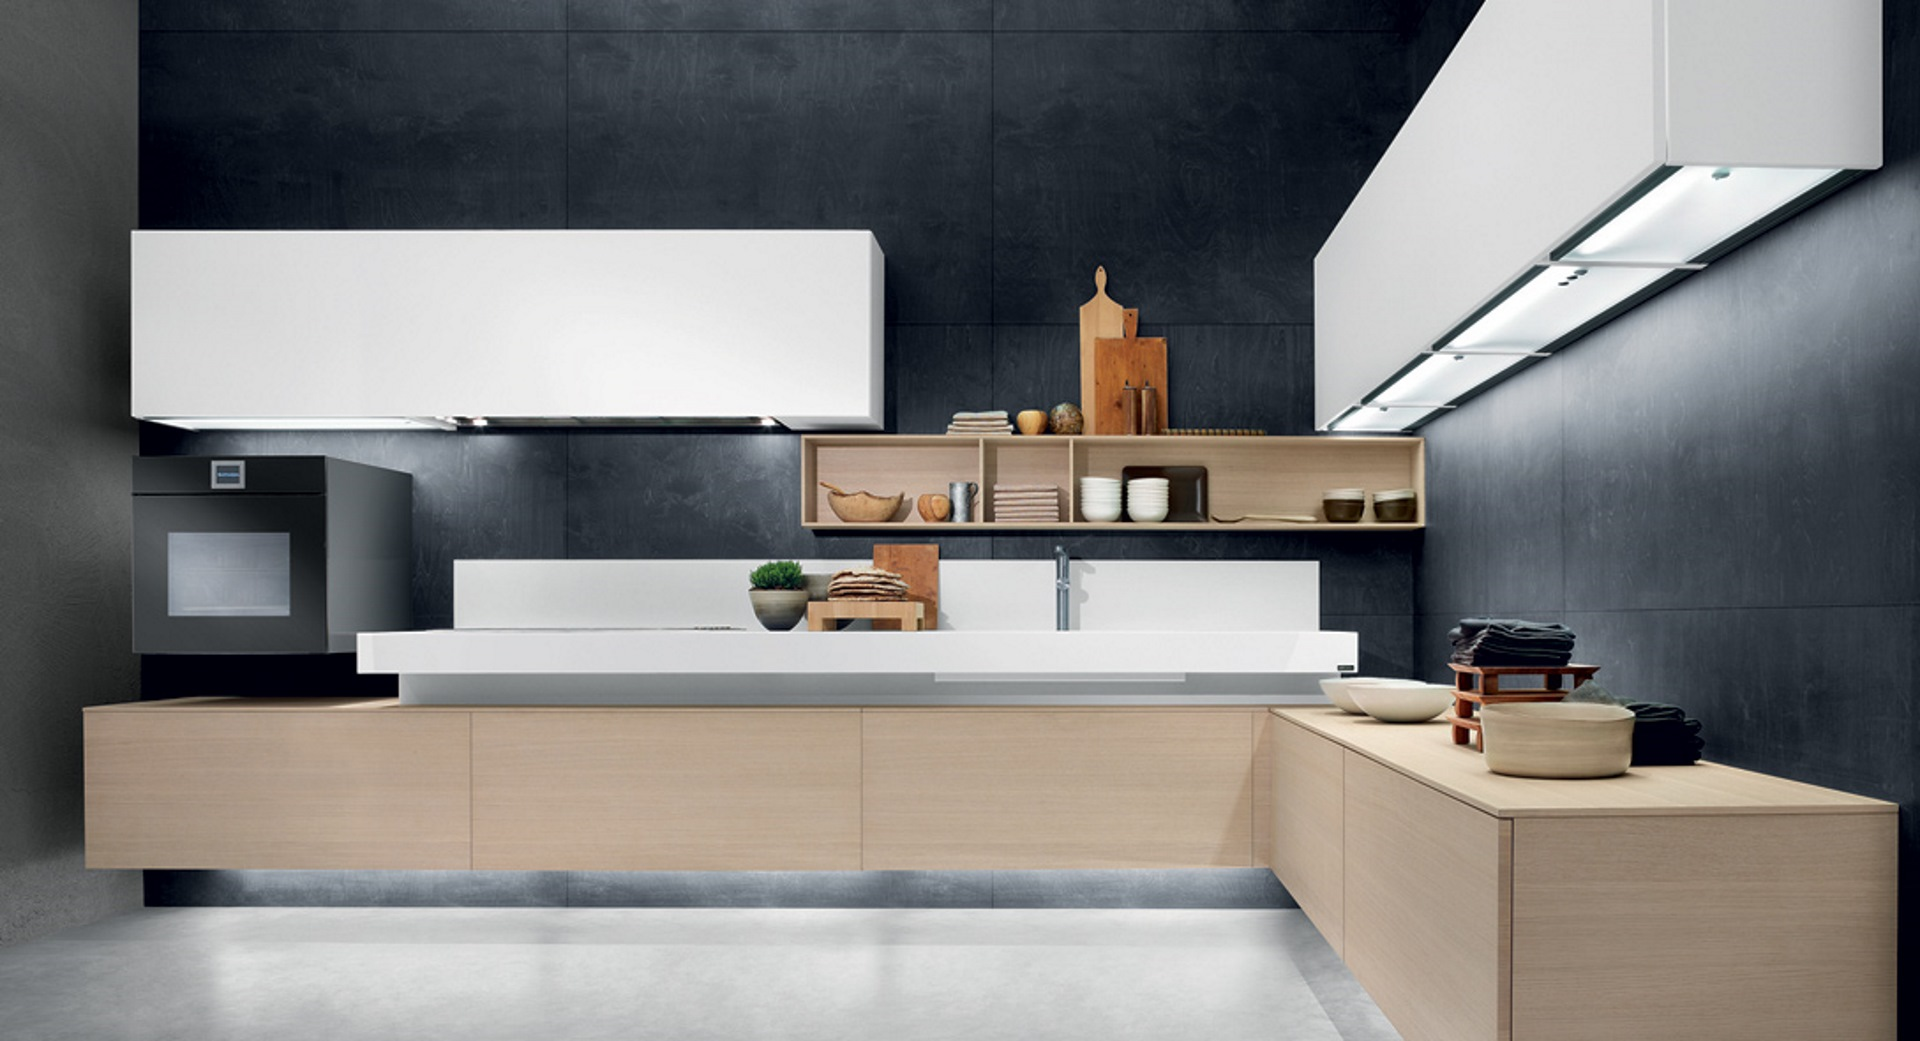 Cucine Moderne Con Basi Sospese.Free Cucina Moderna Con Basi Ed Elementi Sospesi Cucine